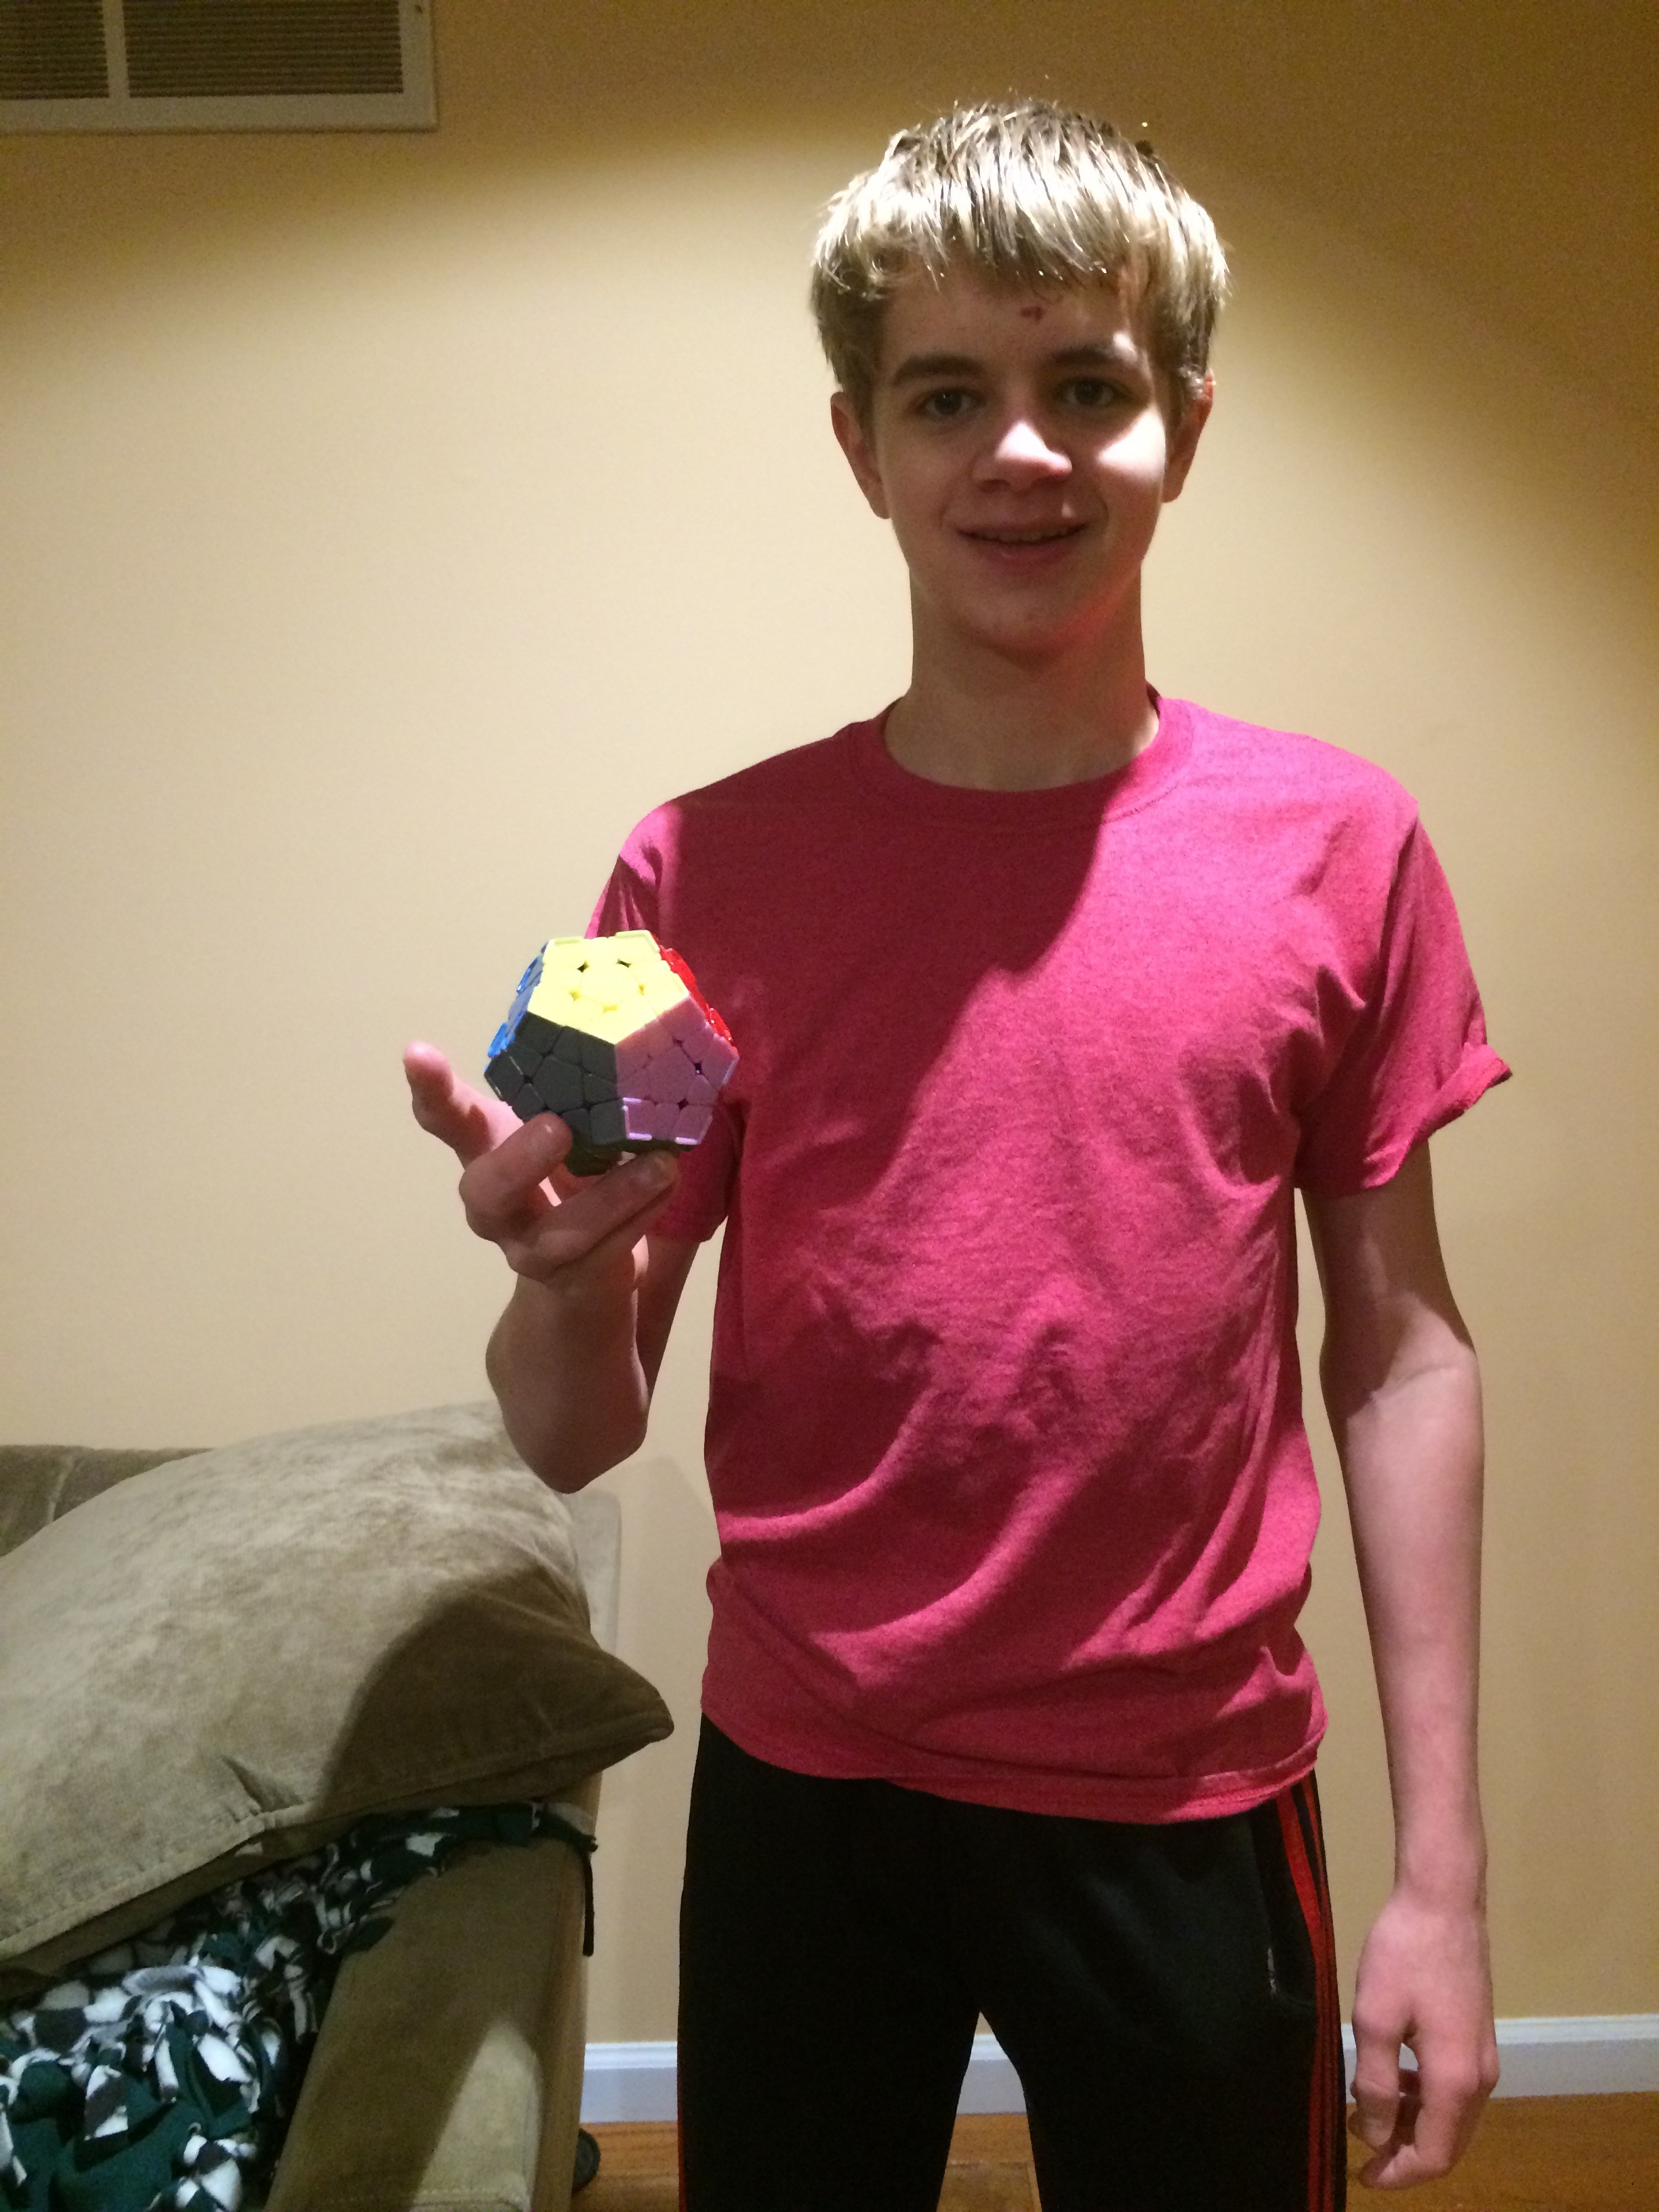 Matt Stephens with his amazing rubix cube. Photo by Ben Kraizer